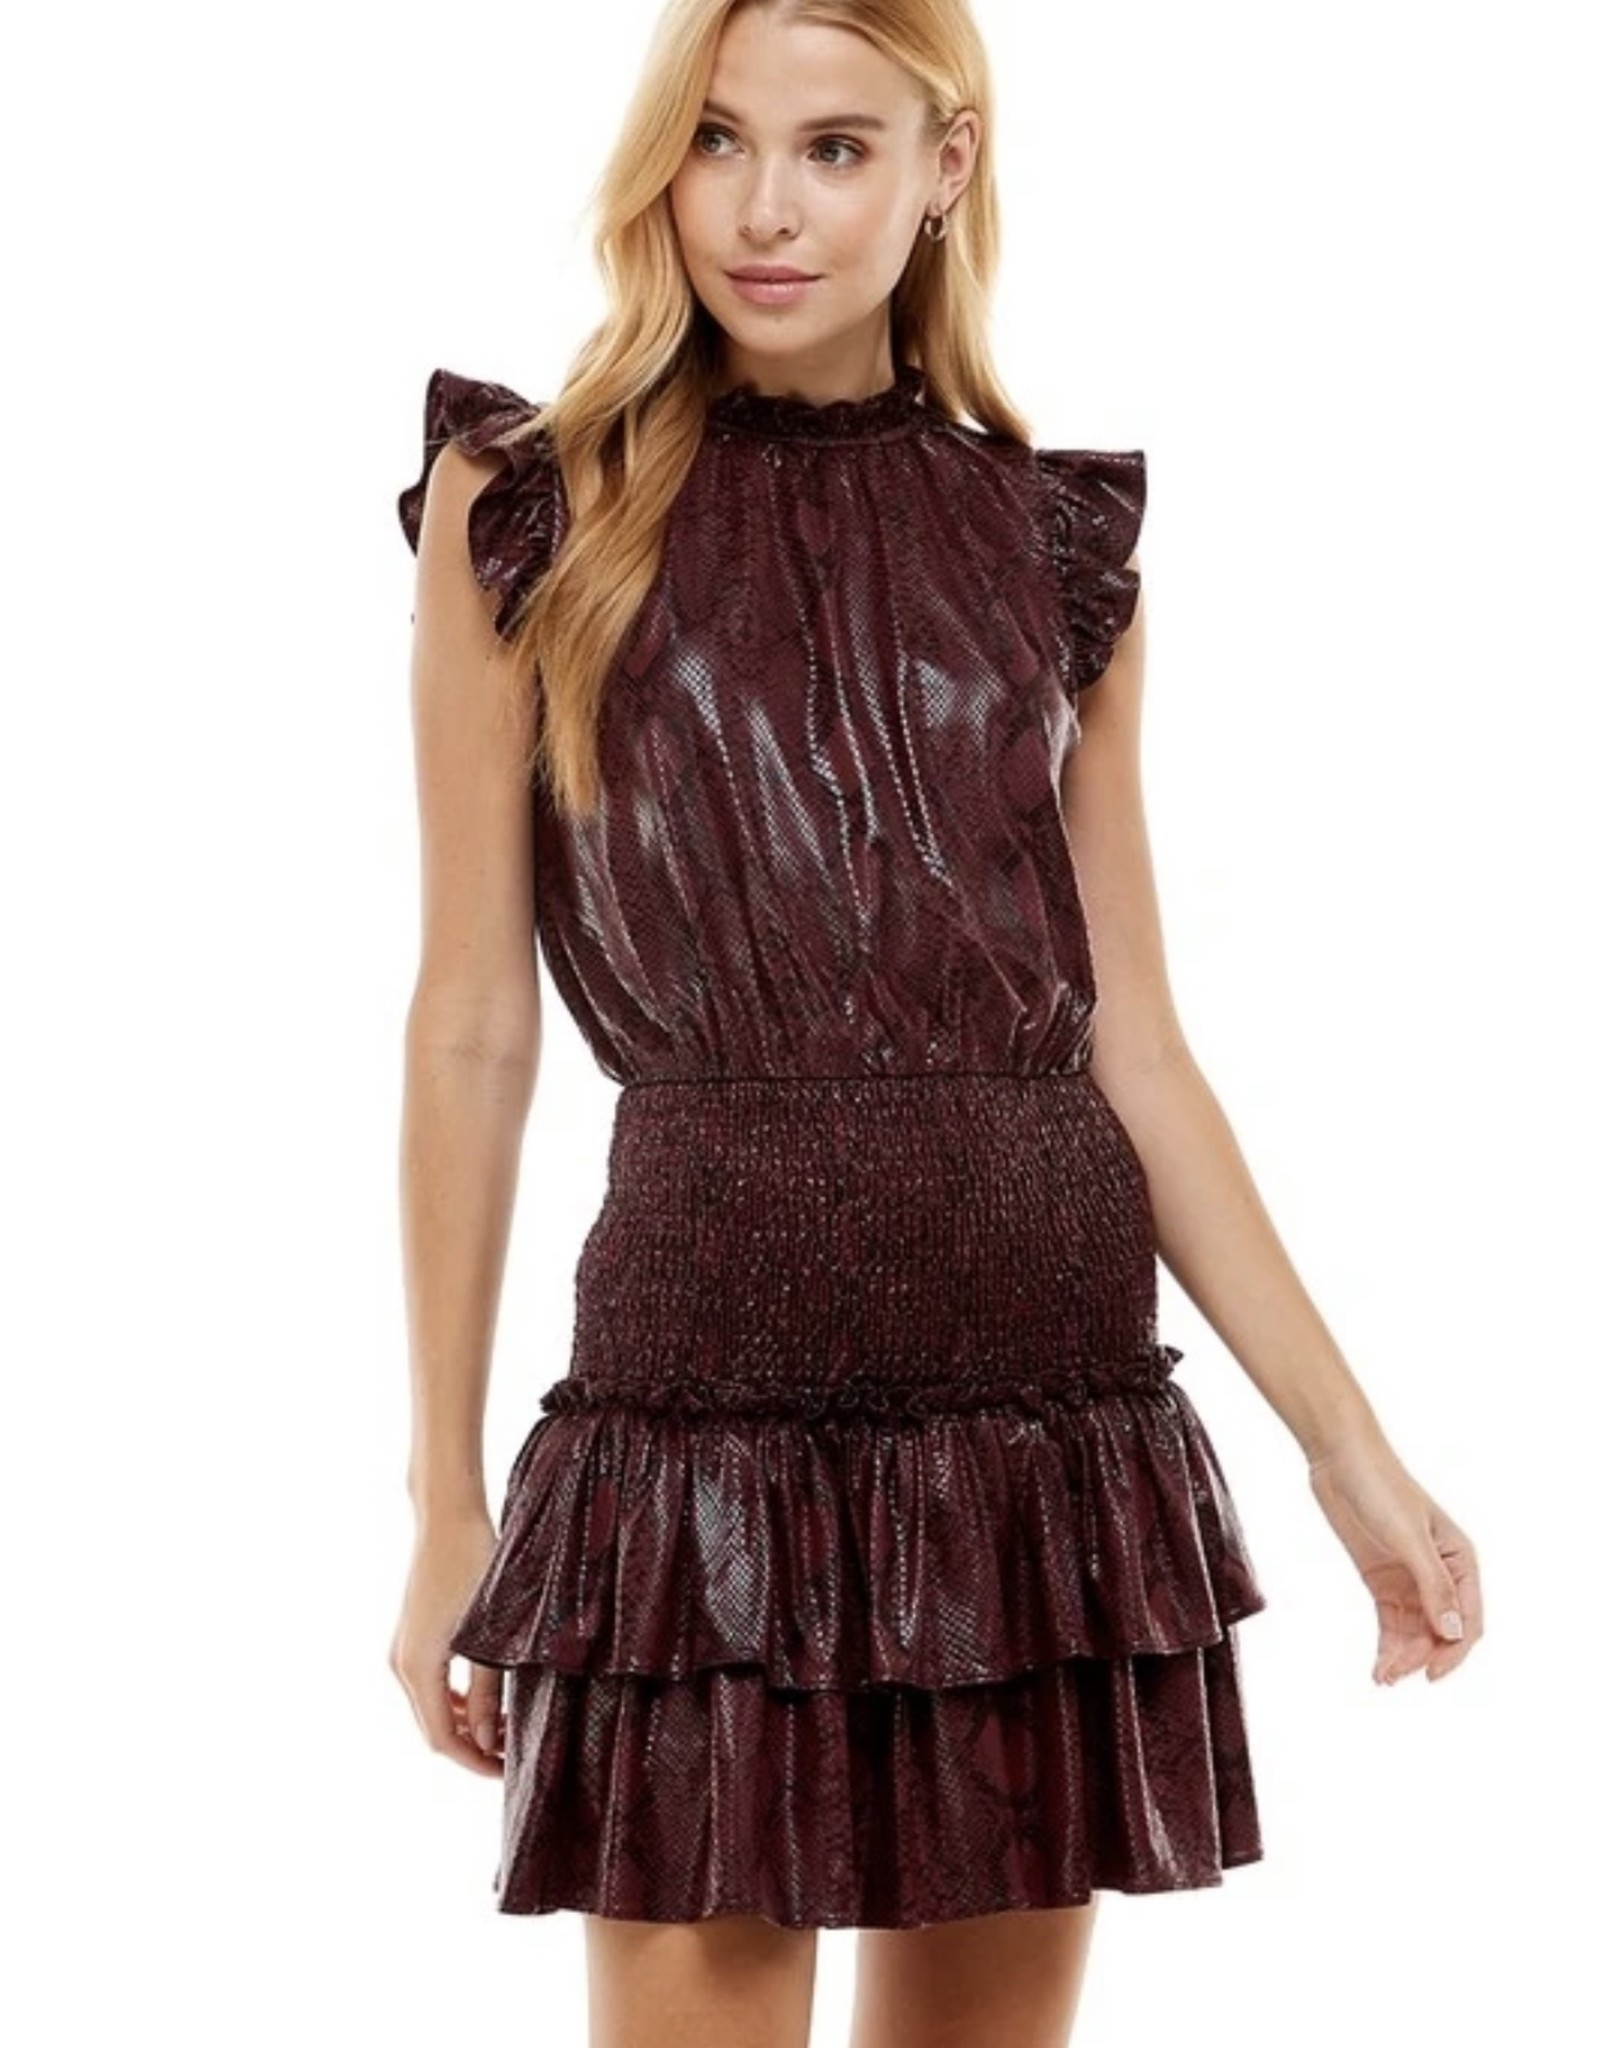 Ruffled Snake Print Dress